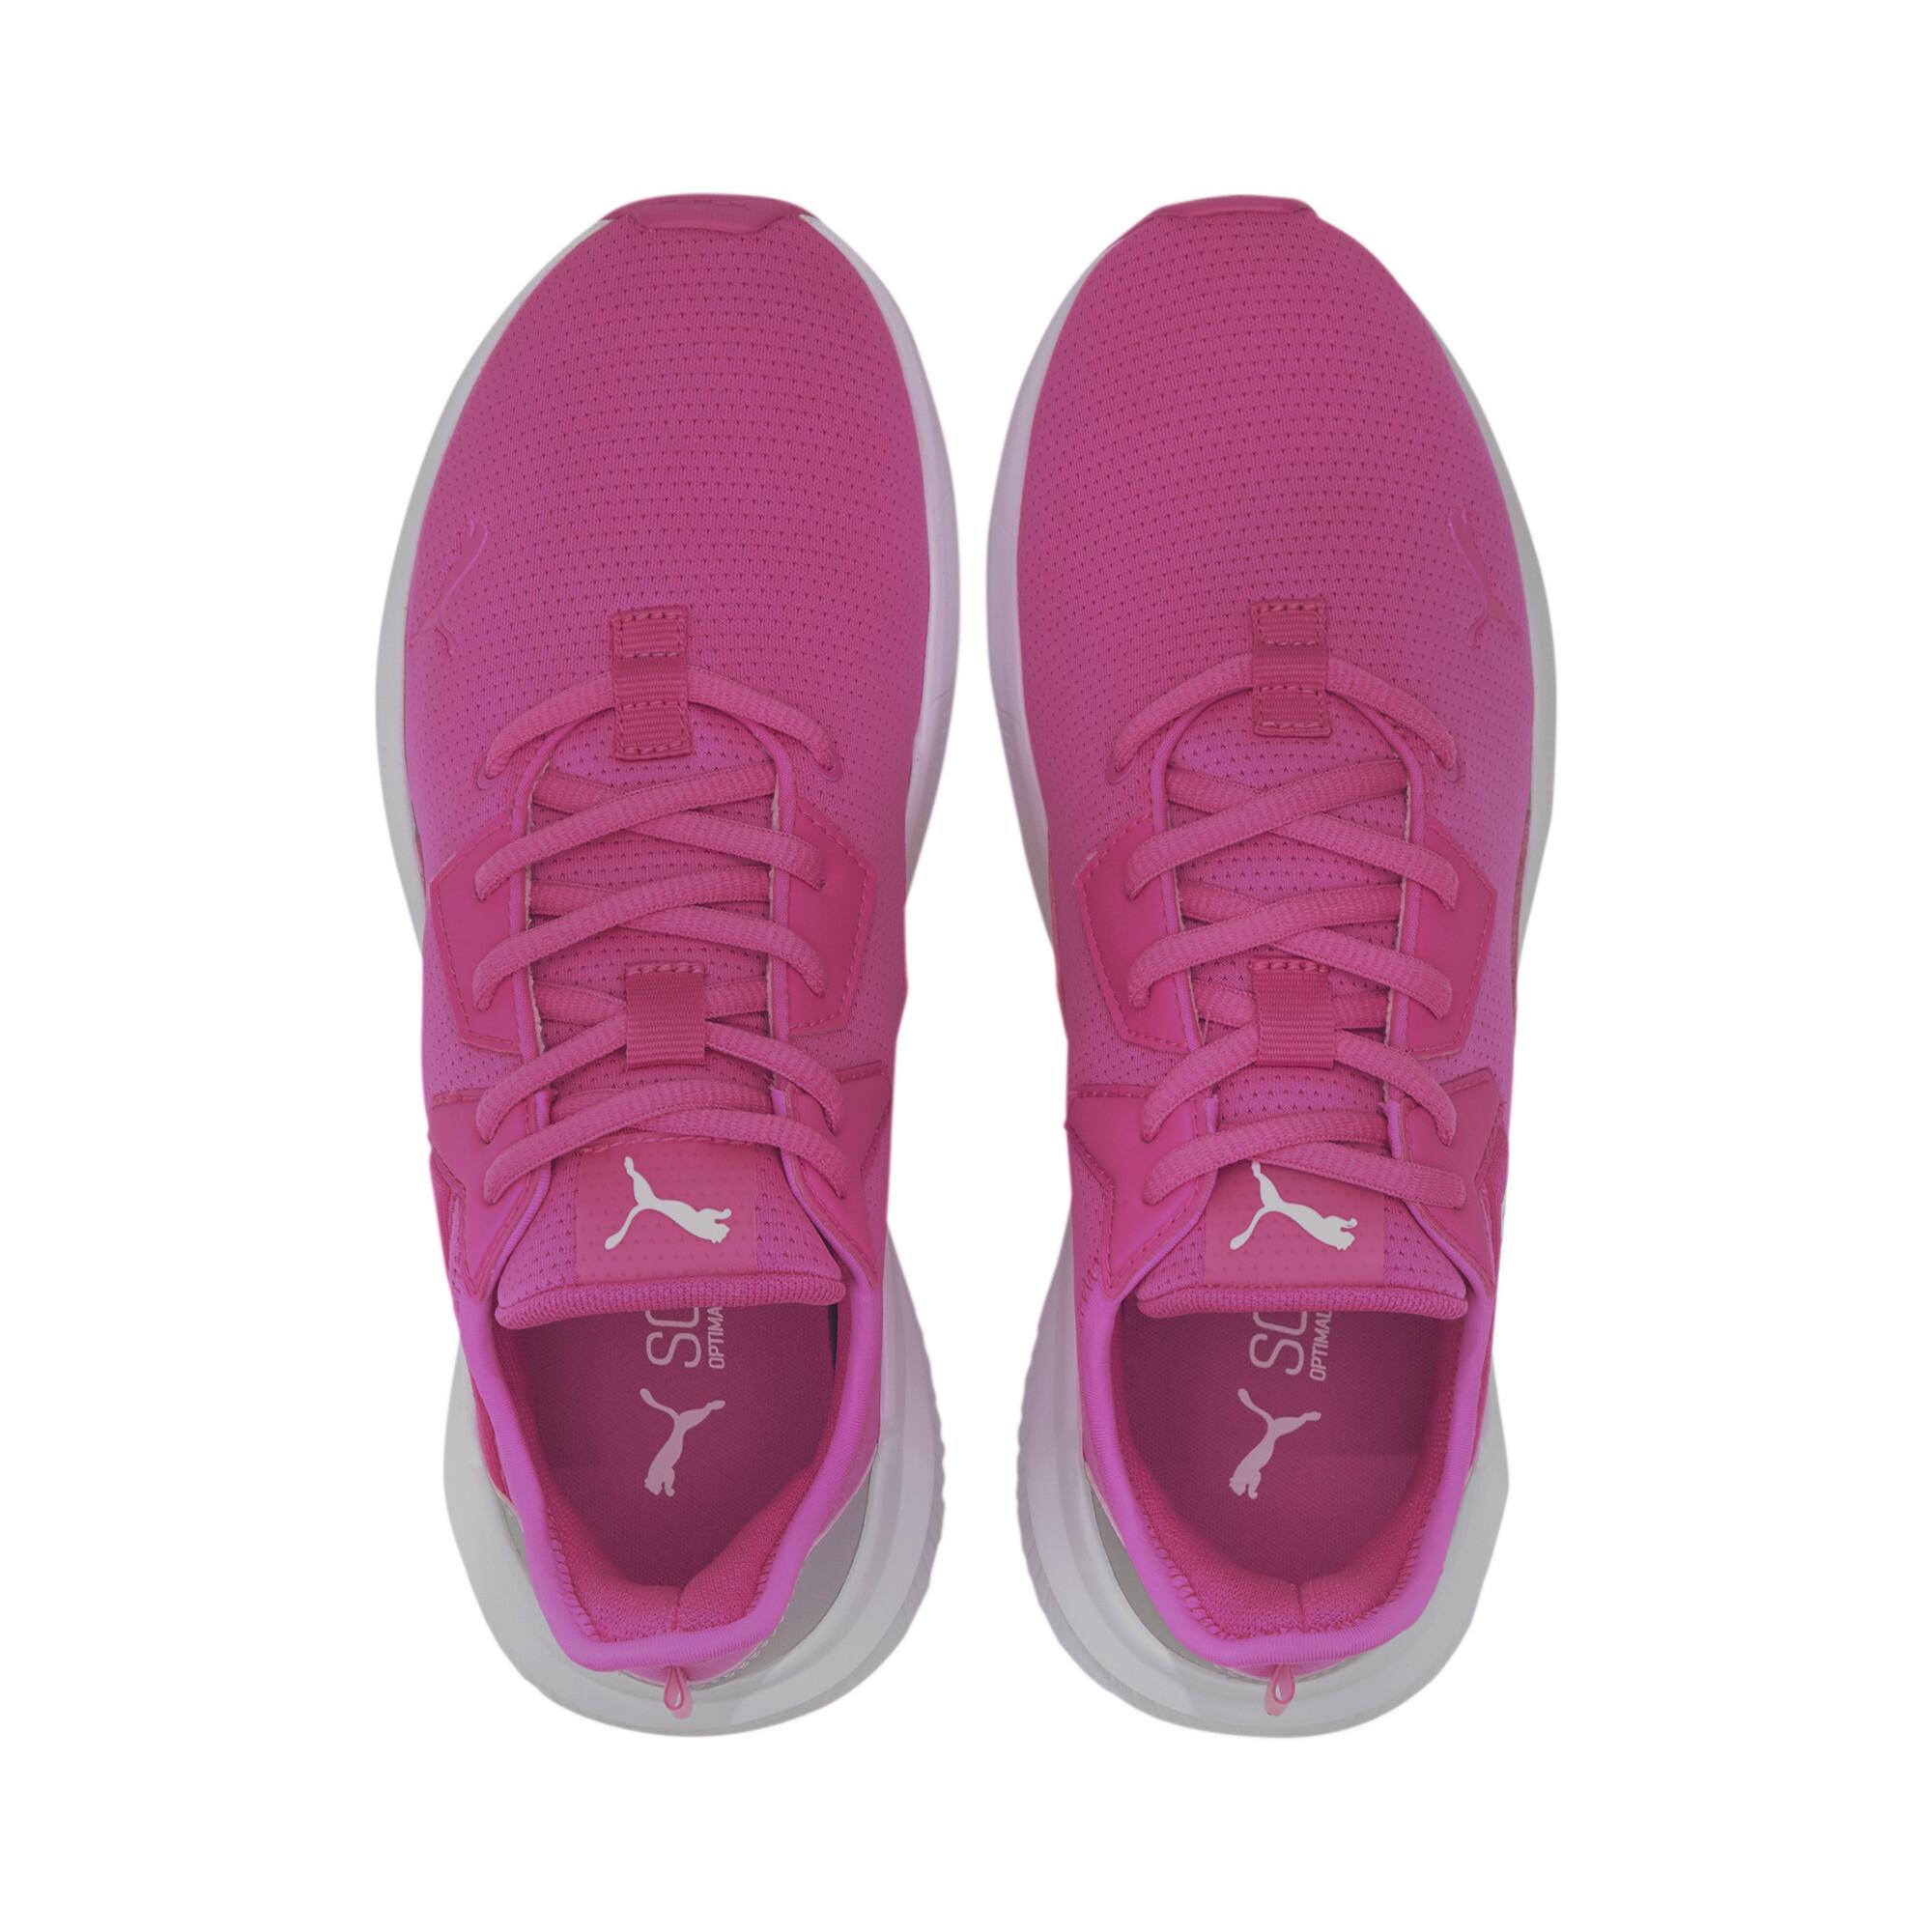 thumbnail 15 - PUMA-Women-039-s-Platinum-Training-Shoes